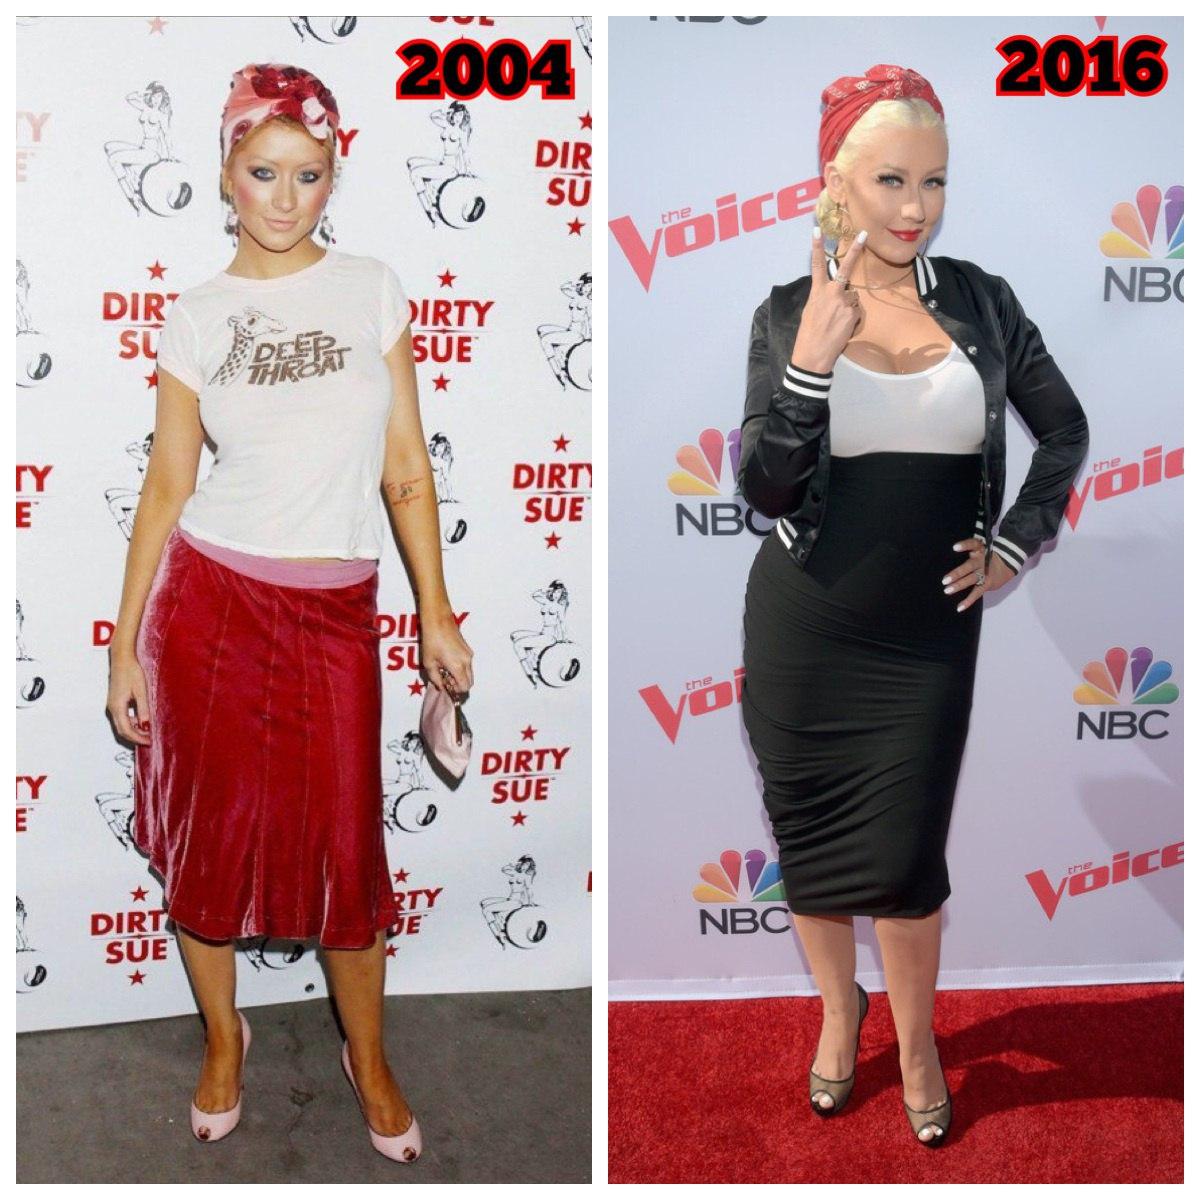 Christina Aguilera - Página 3 1brJCWL4gDk